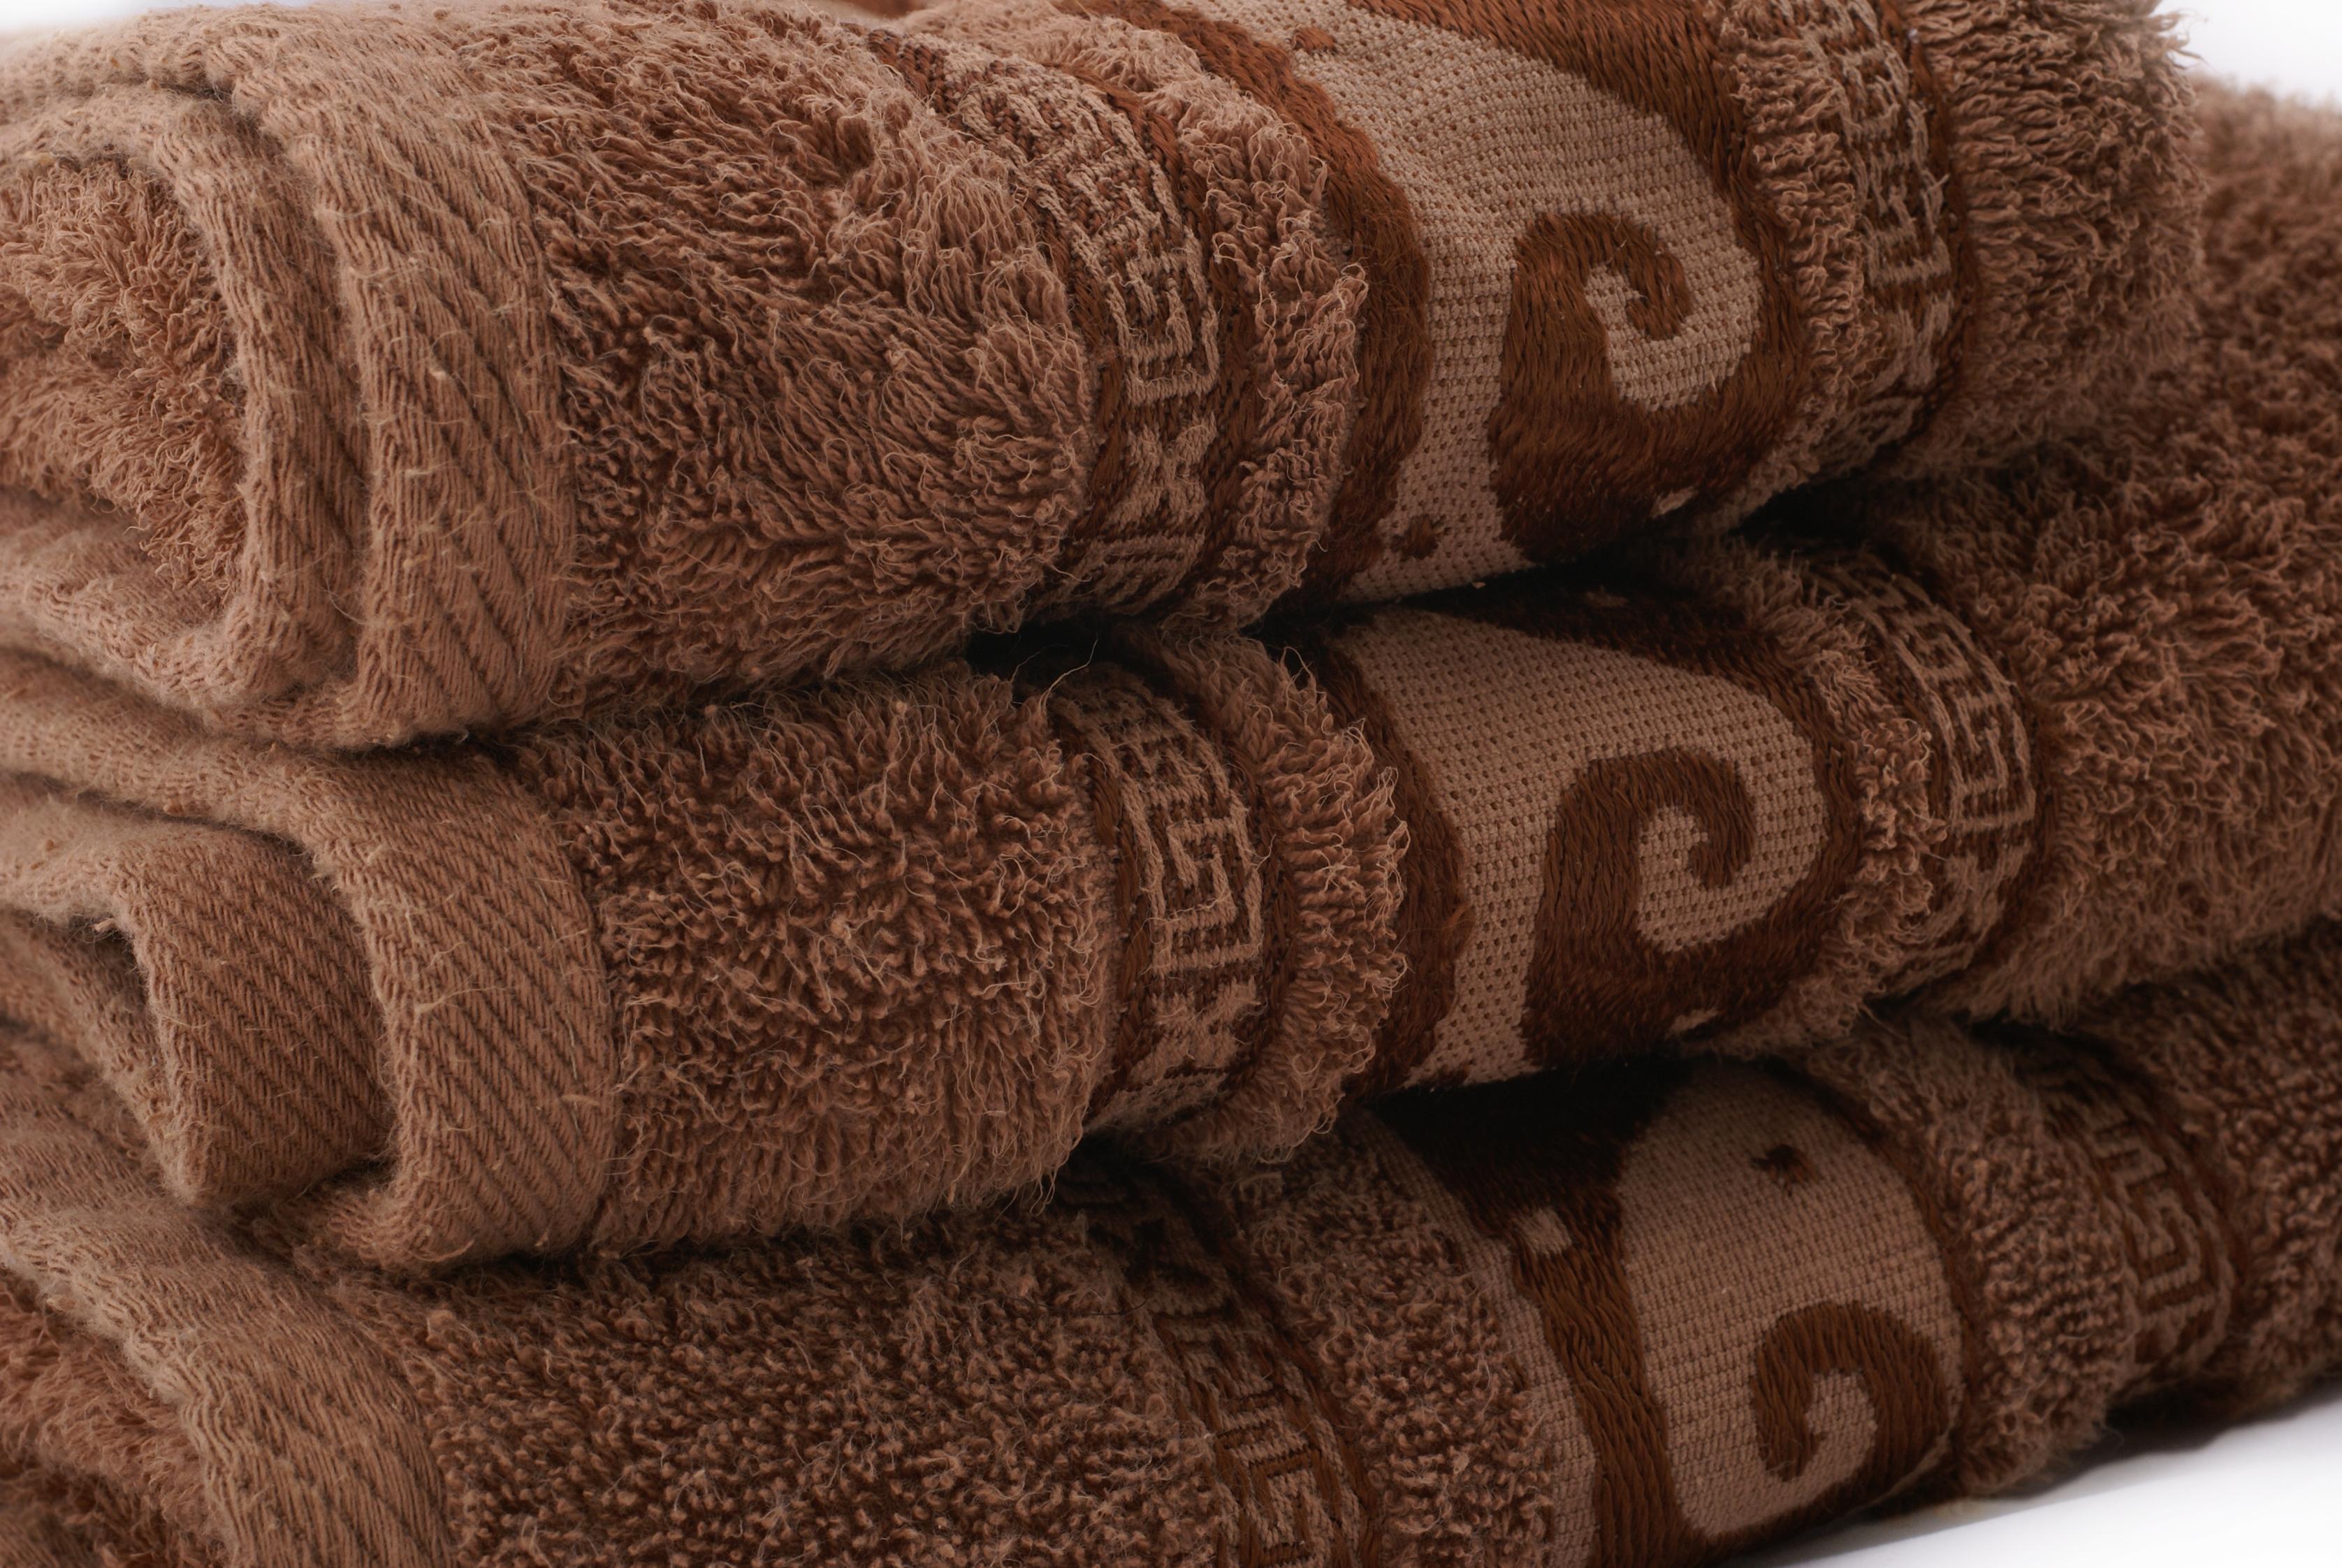 Luxury woven border towel.